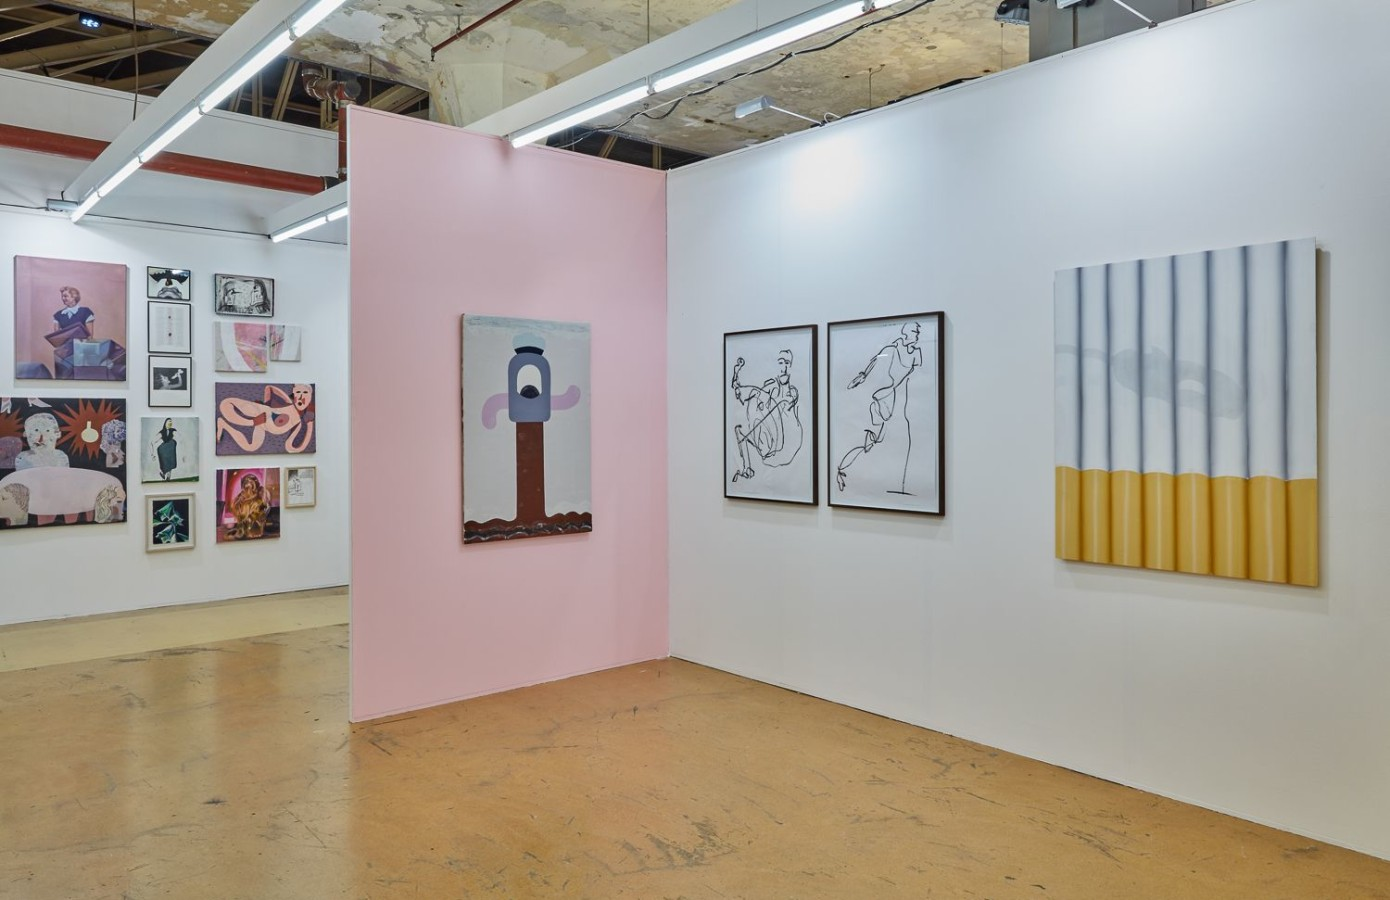 Art Rotterdam 2019, Nel Aerts, Beni Bischof, Jenny Brosinski, William Ludwig Lutgens,